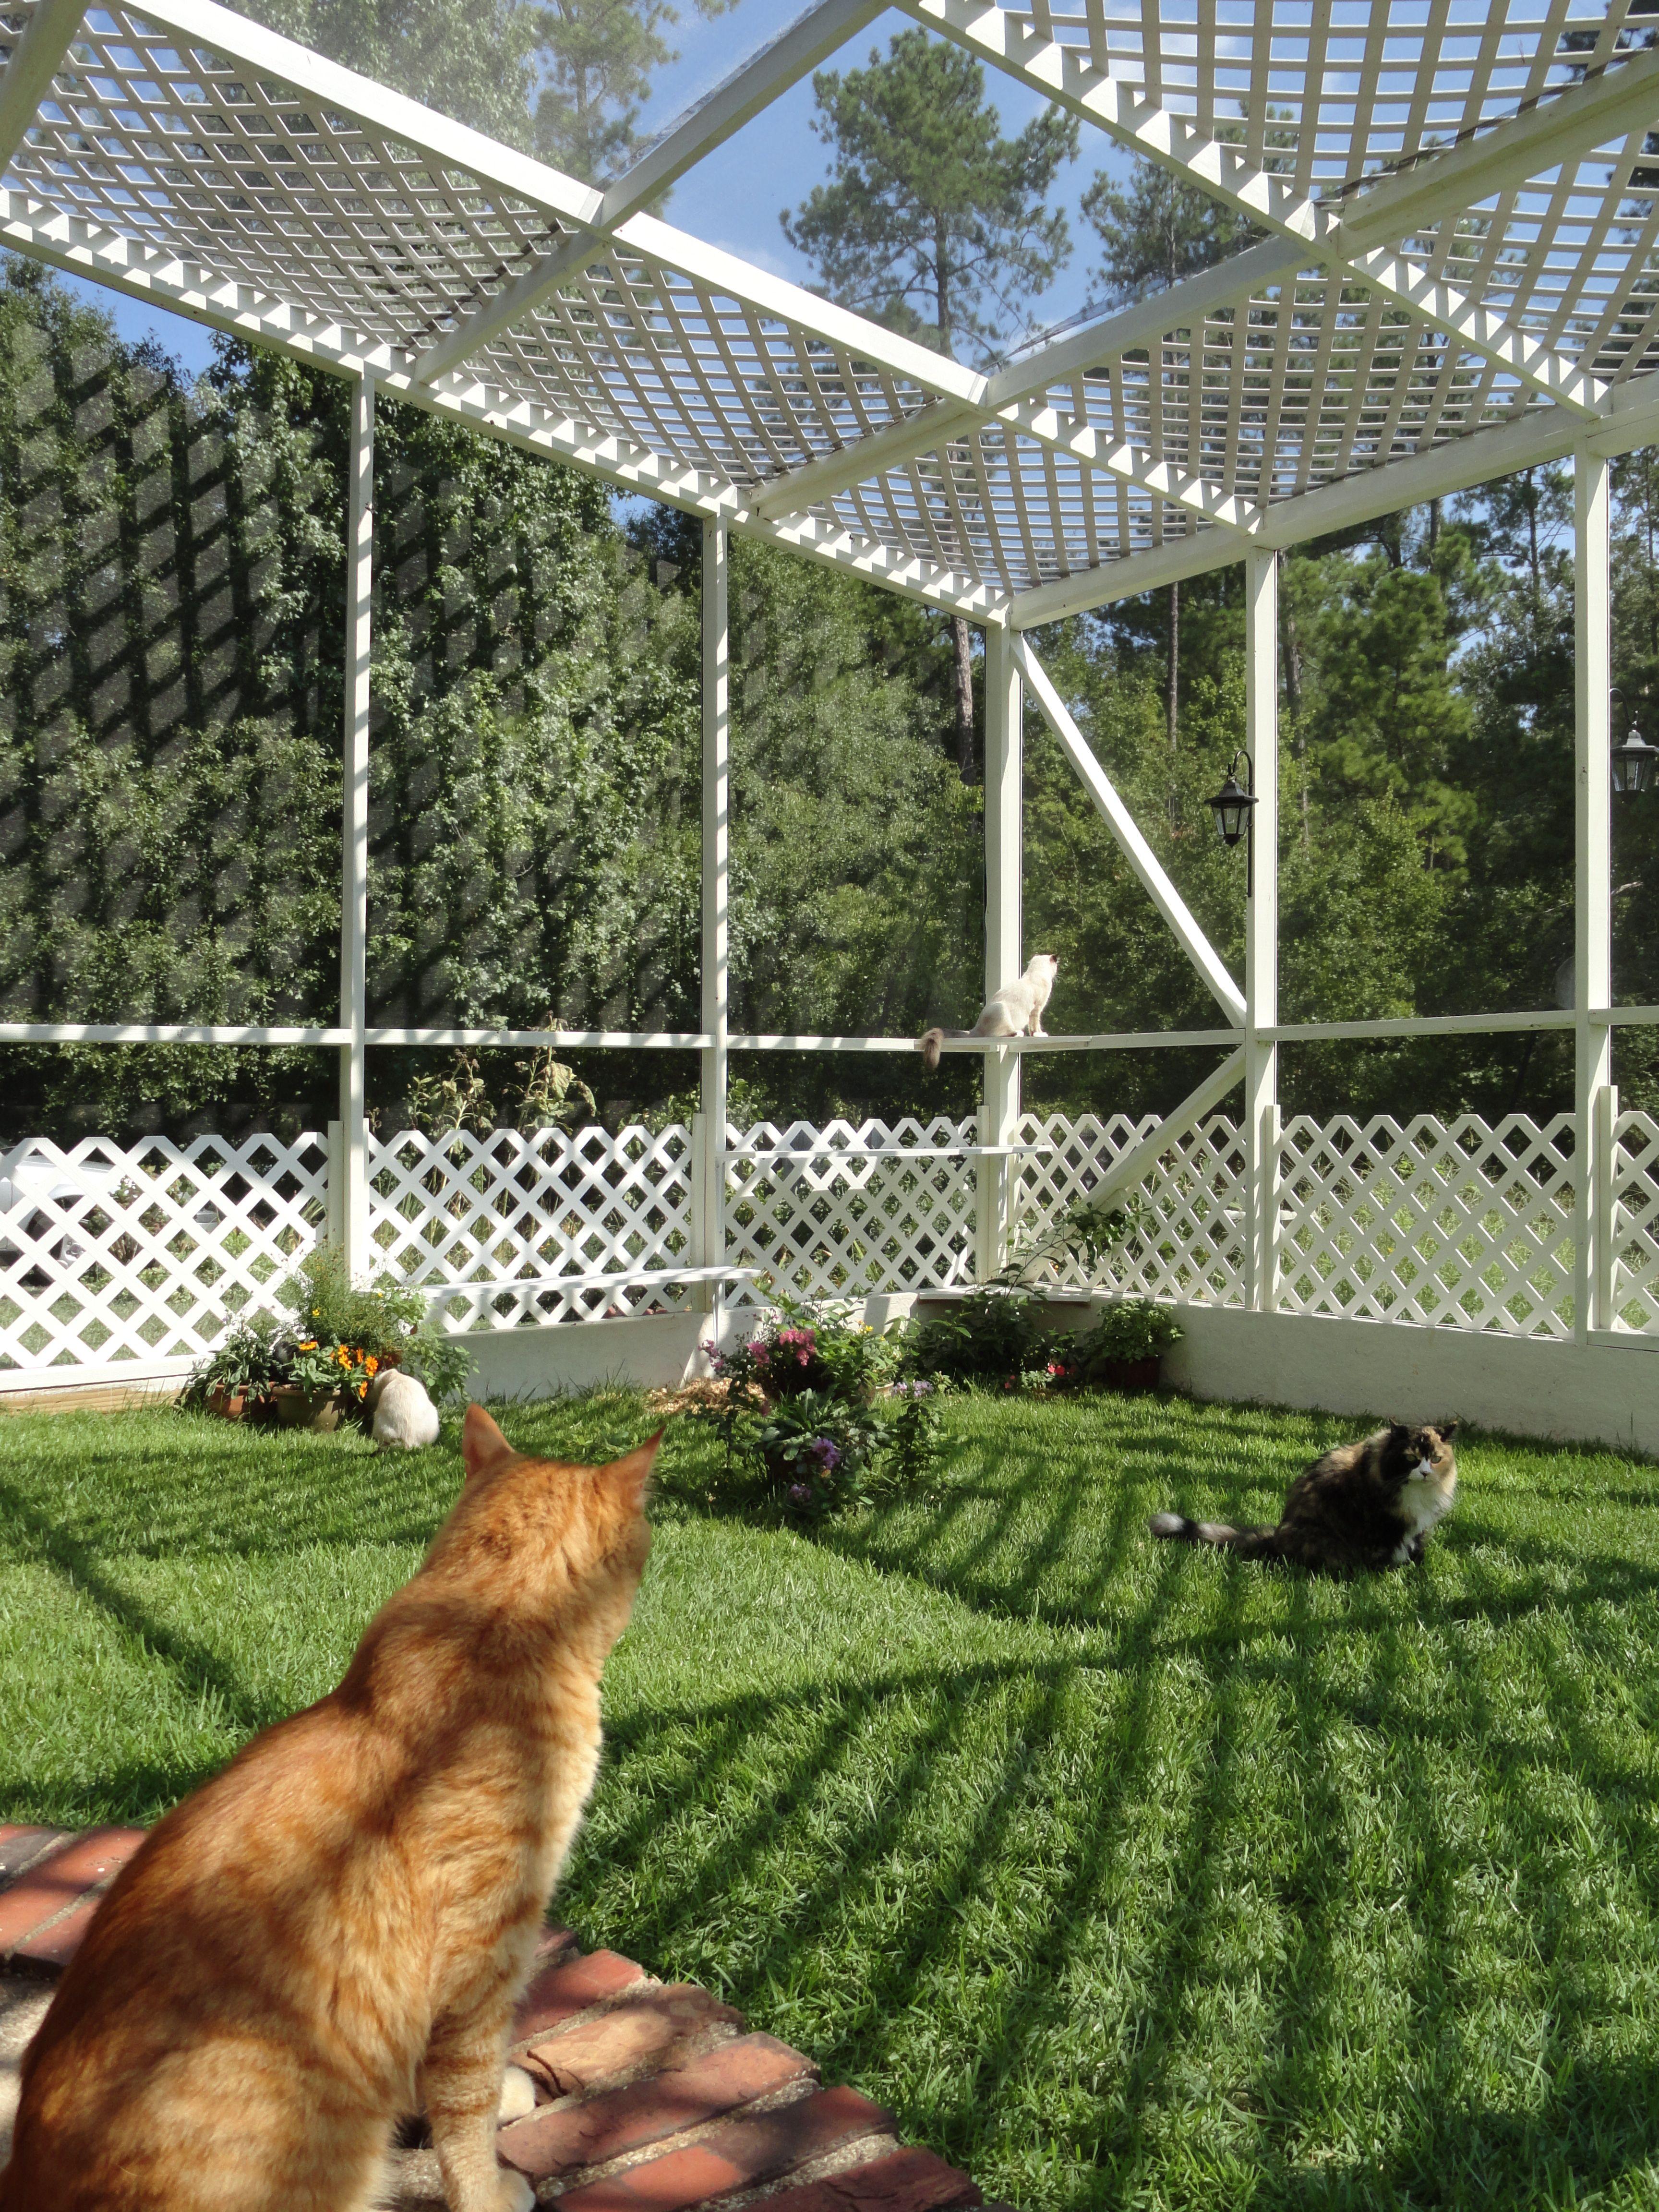 kitties enjoying their garden catio outdoor cat enclosure pinterest katzen. Black Bedroom Furniture Sets. Home Design Ideas